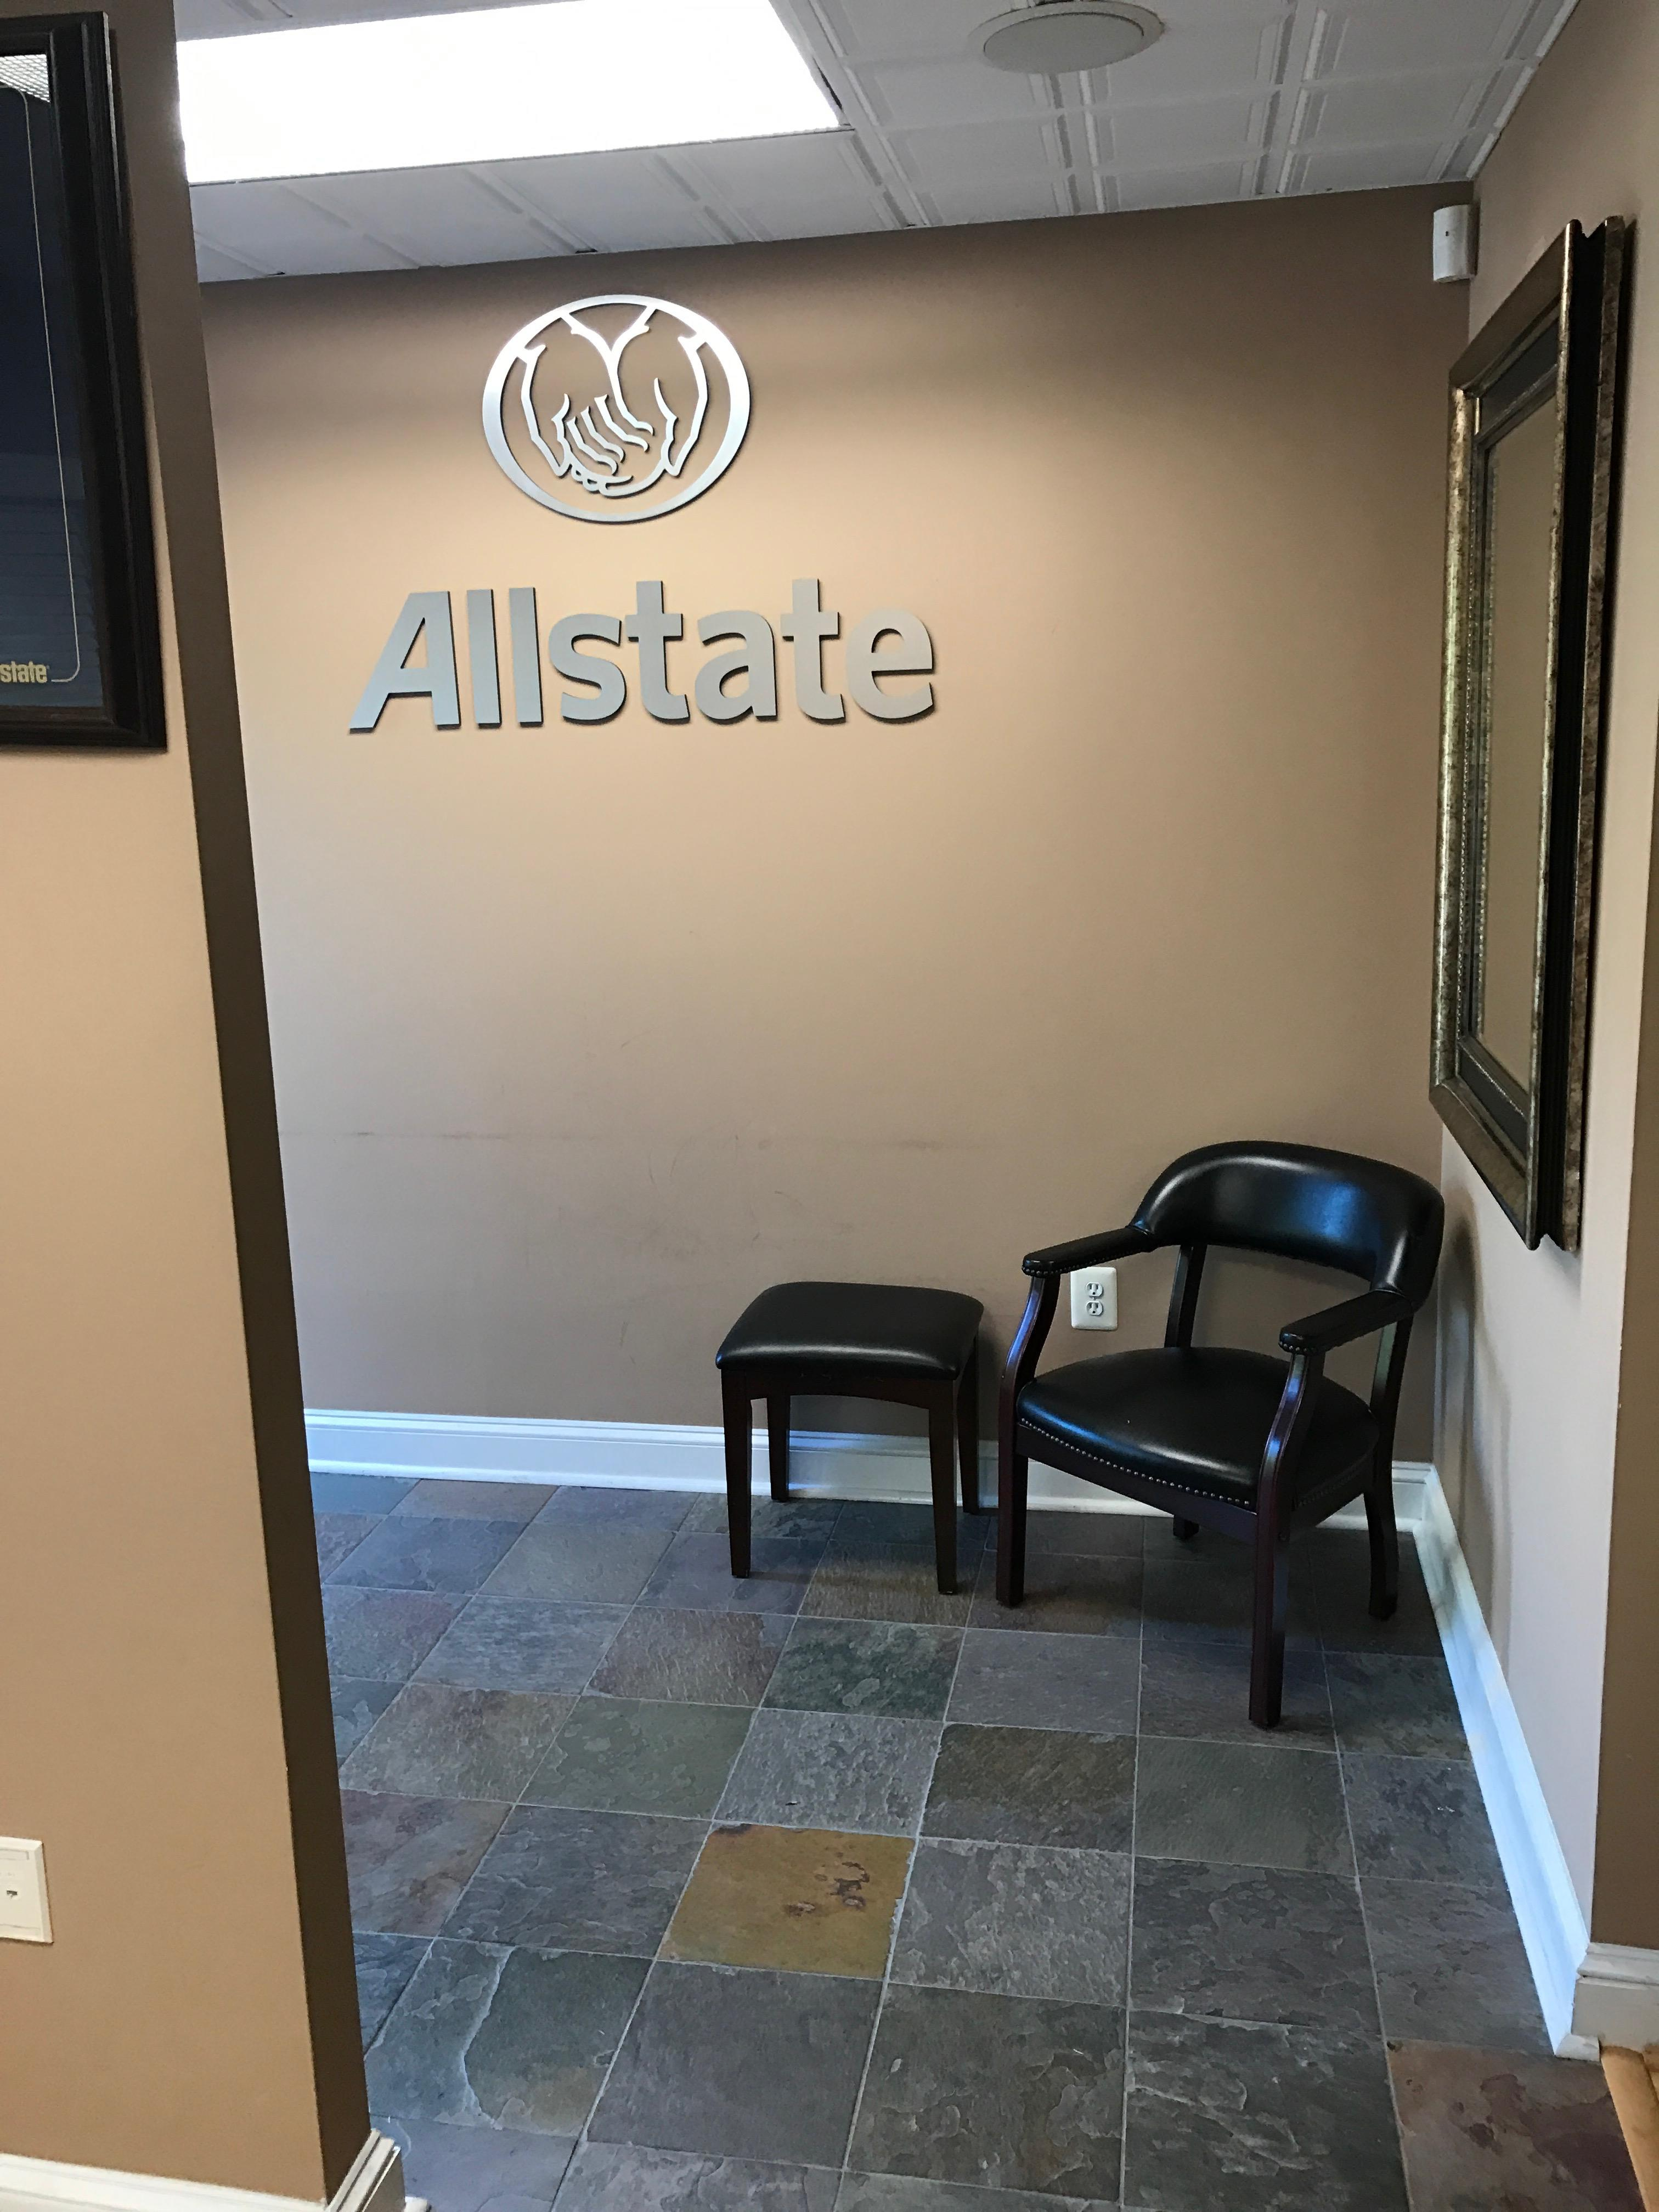 Allstate Insurance Agent: J. Kevin Hughes image 1